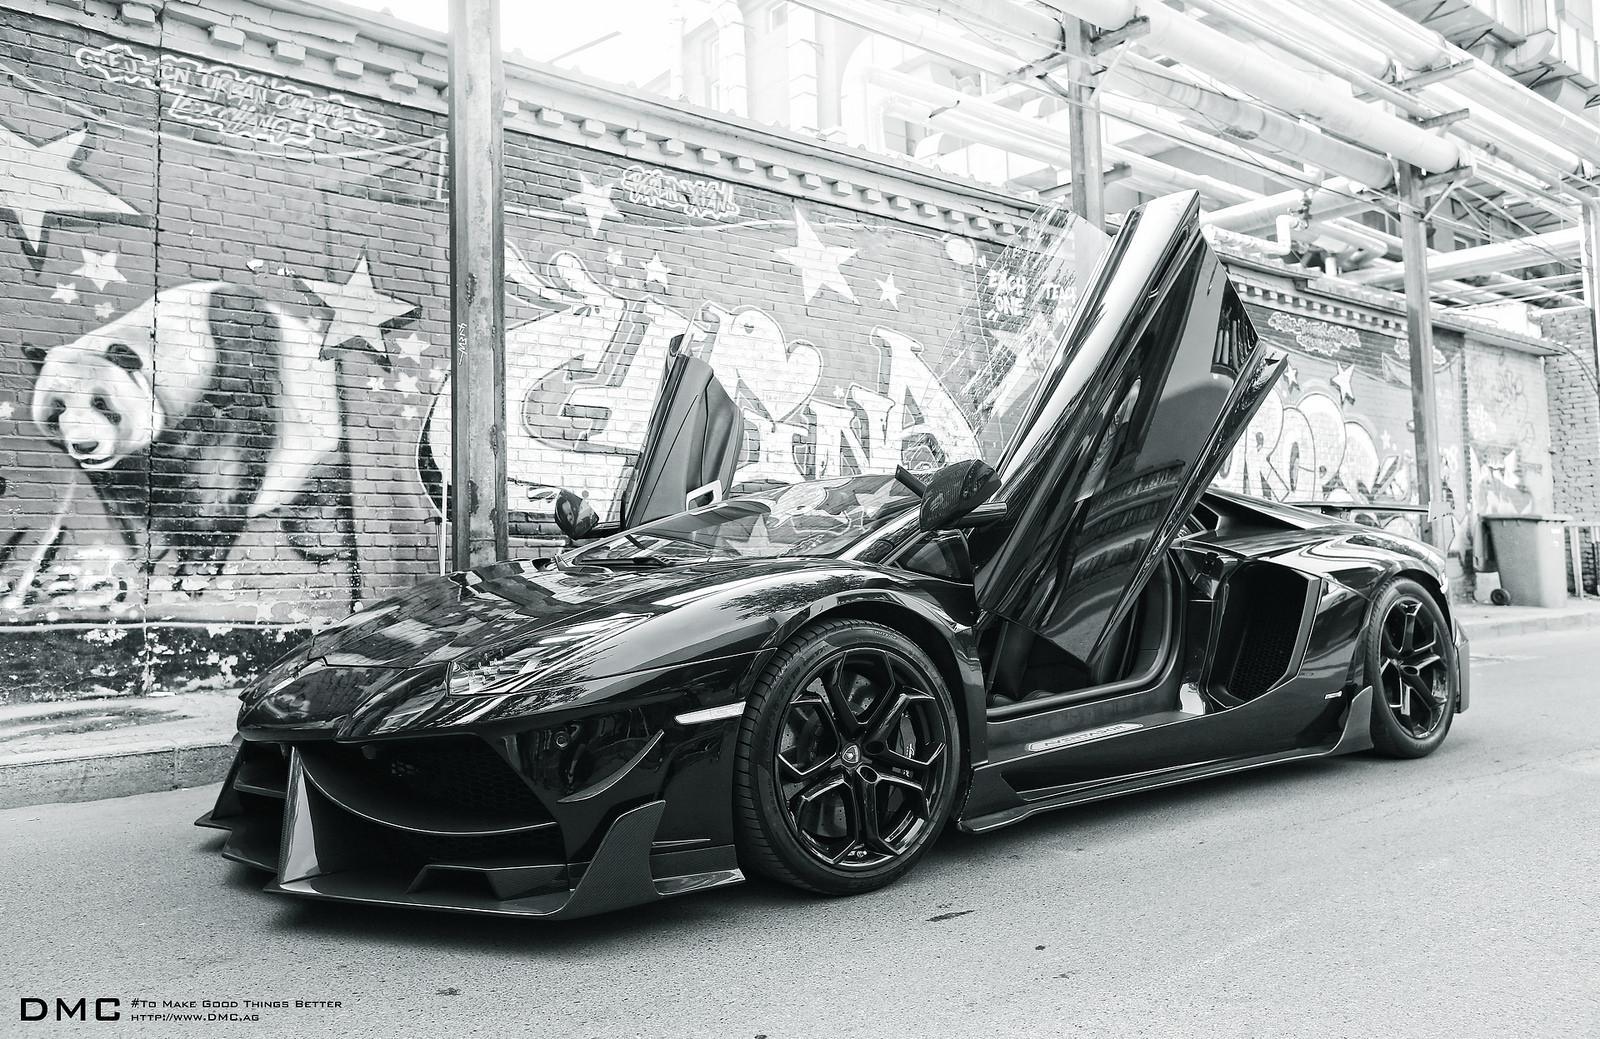 dmc 39 s 1 000 hp lamborghini aventador goes all black autoevolution. Black Bedroom Furniture Sets. Home Design Ideas